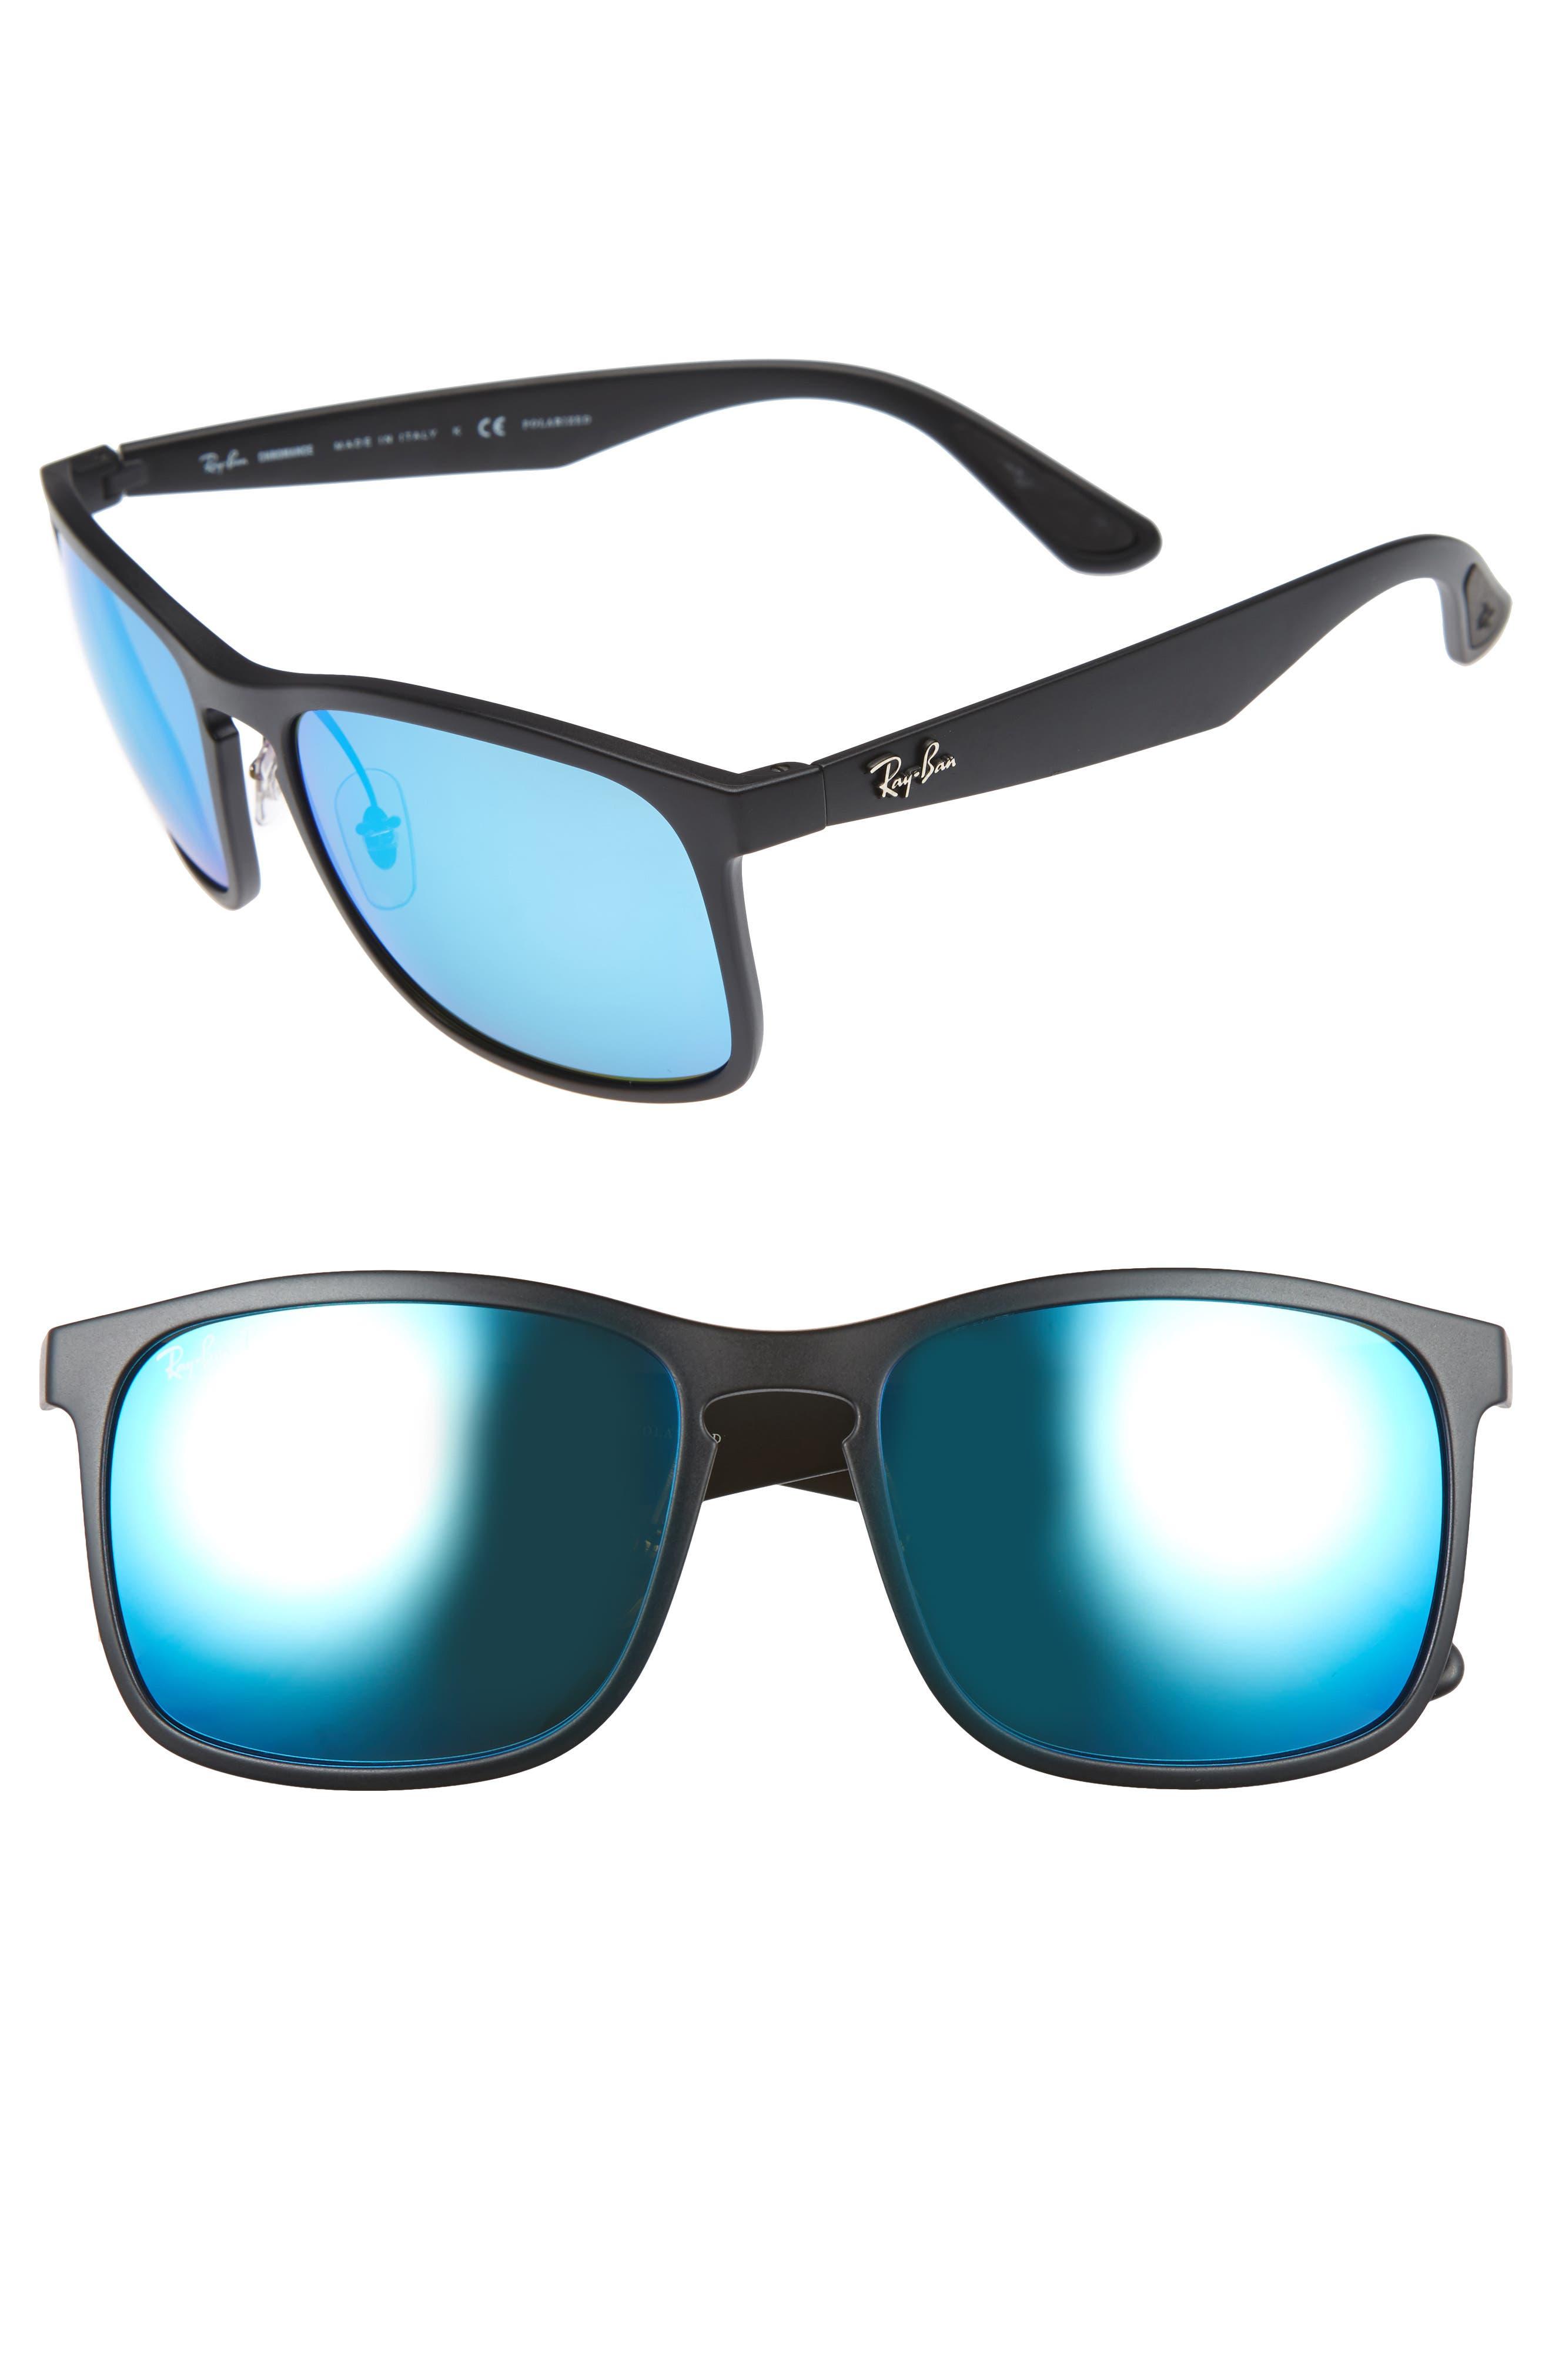 Main Image - Ray-Ban Tech 62mm Polarized Wayfarer Sunglasses